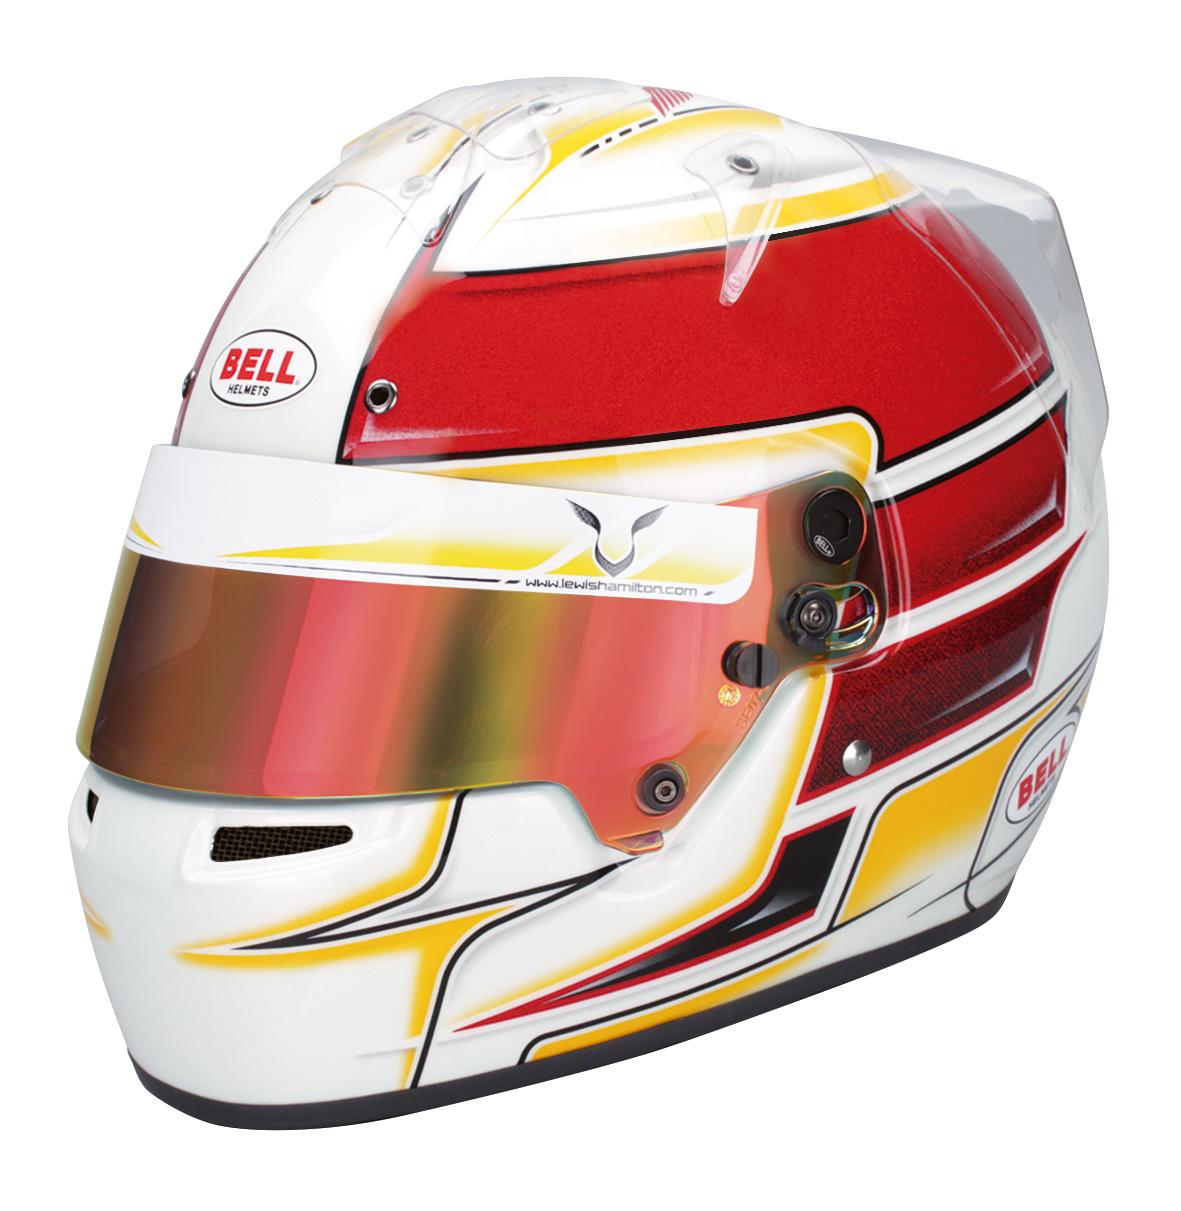 BELL Helm KC7 CMR Lewis Hamilton Edition